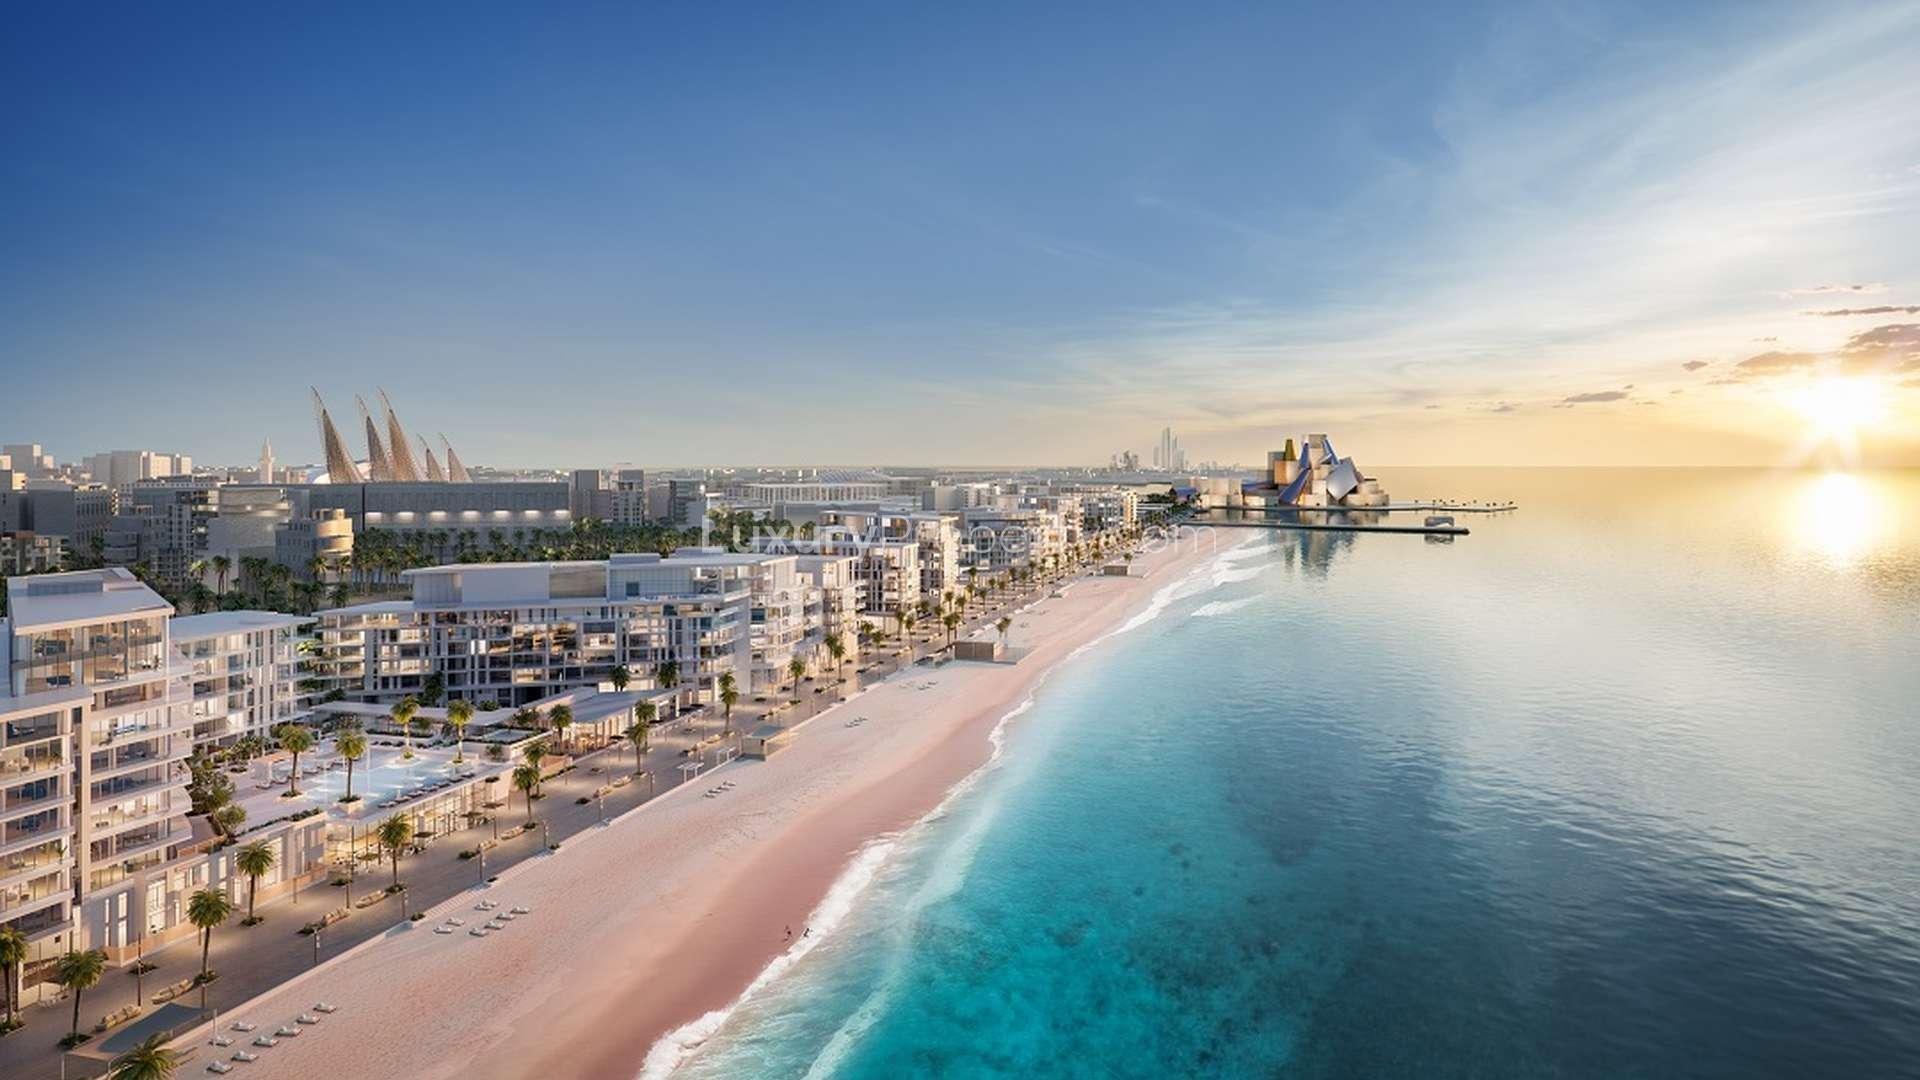 Properties for Sale in Al Saadiyat Island, Abu Dhabi